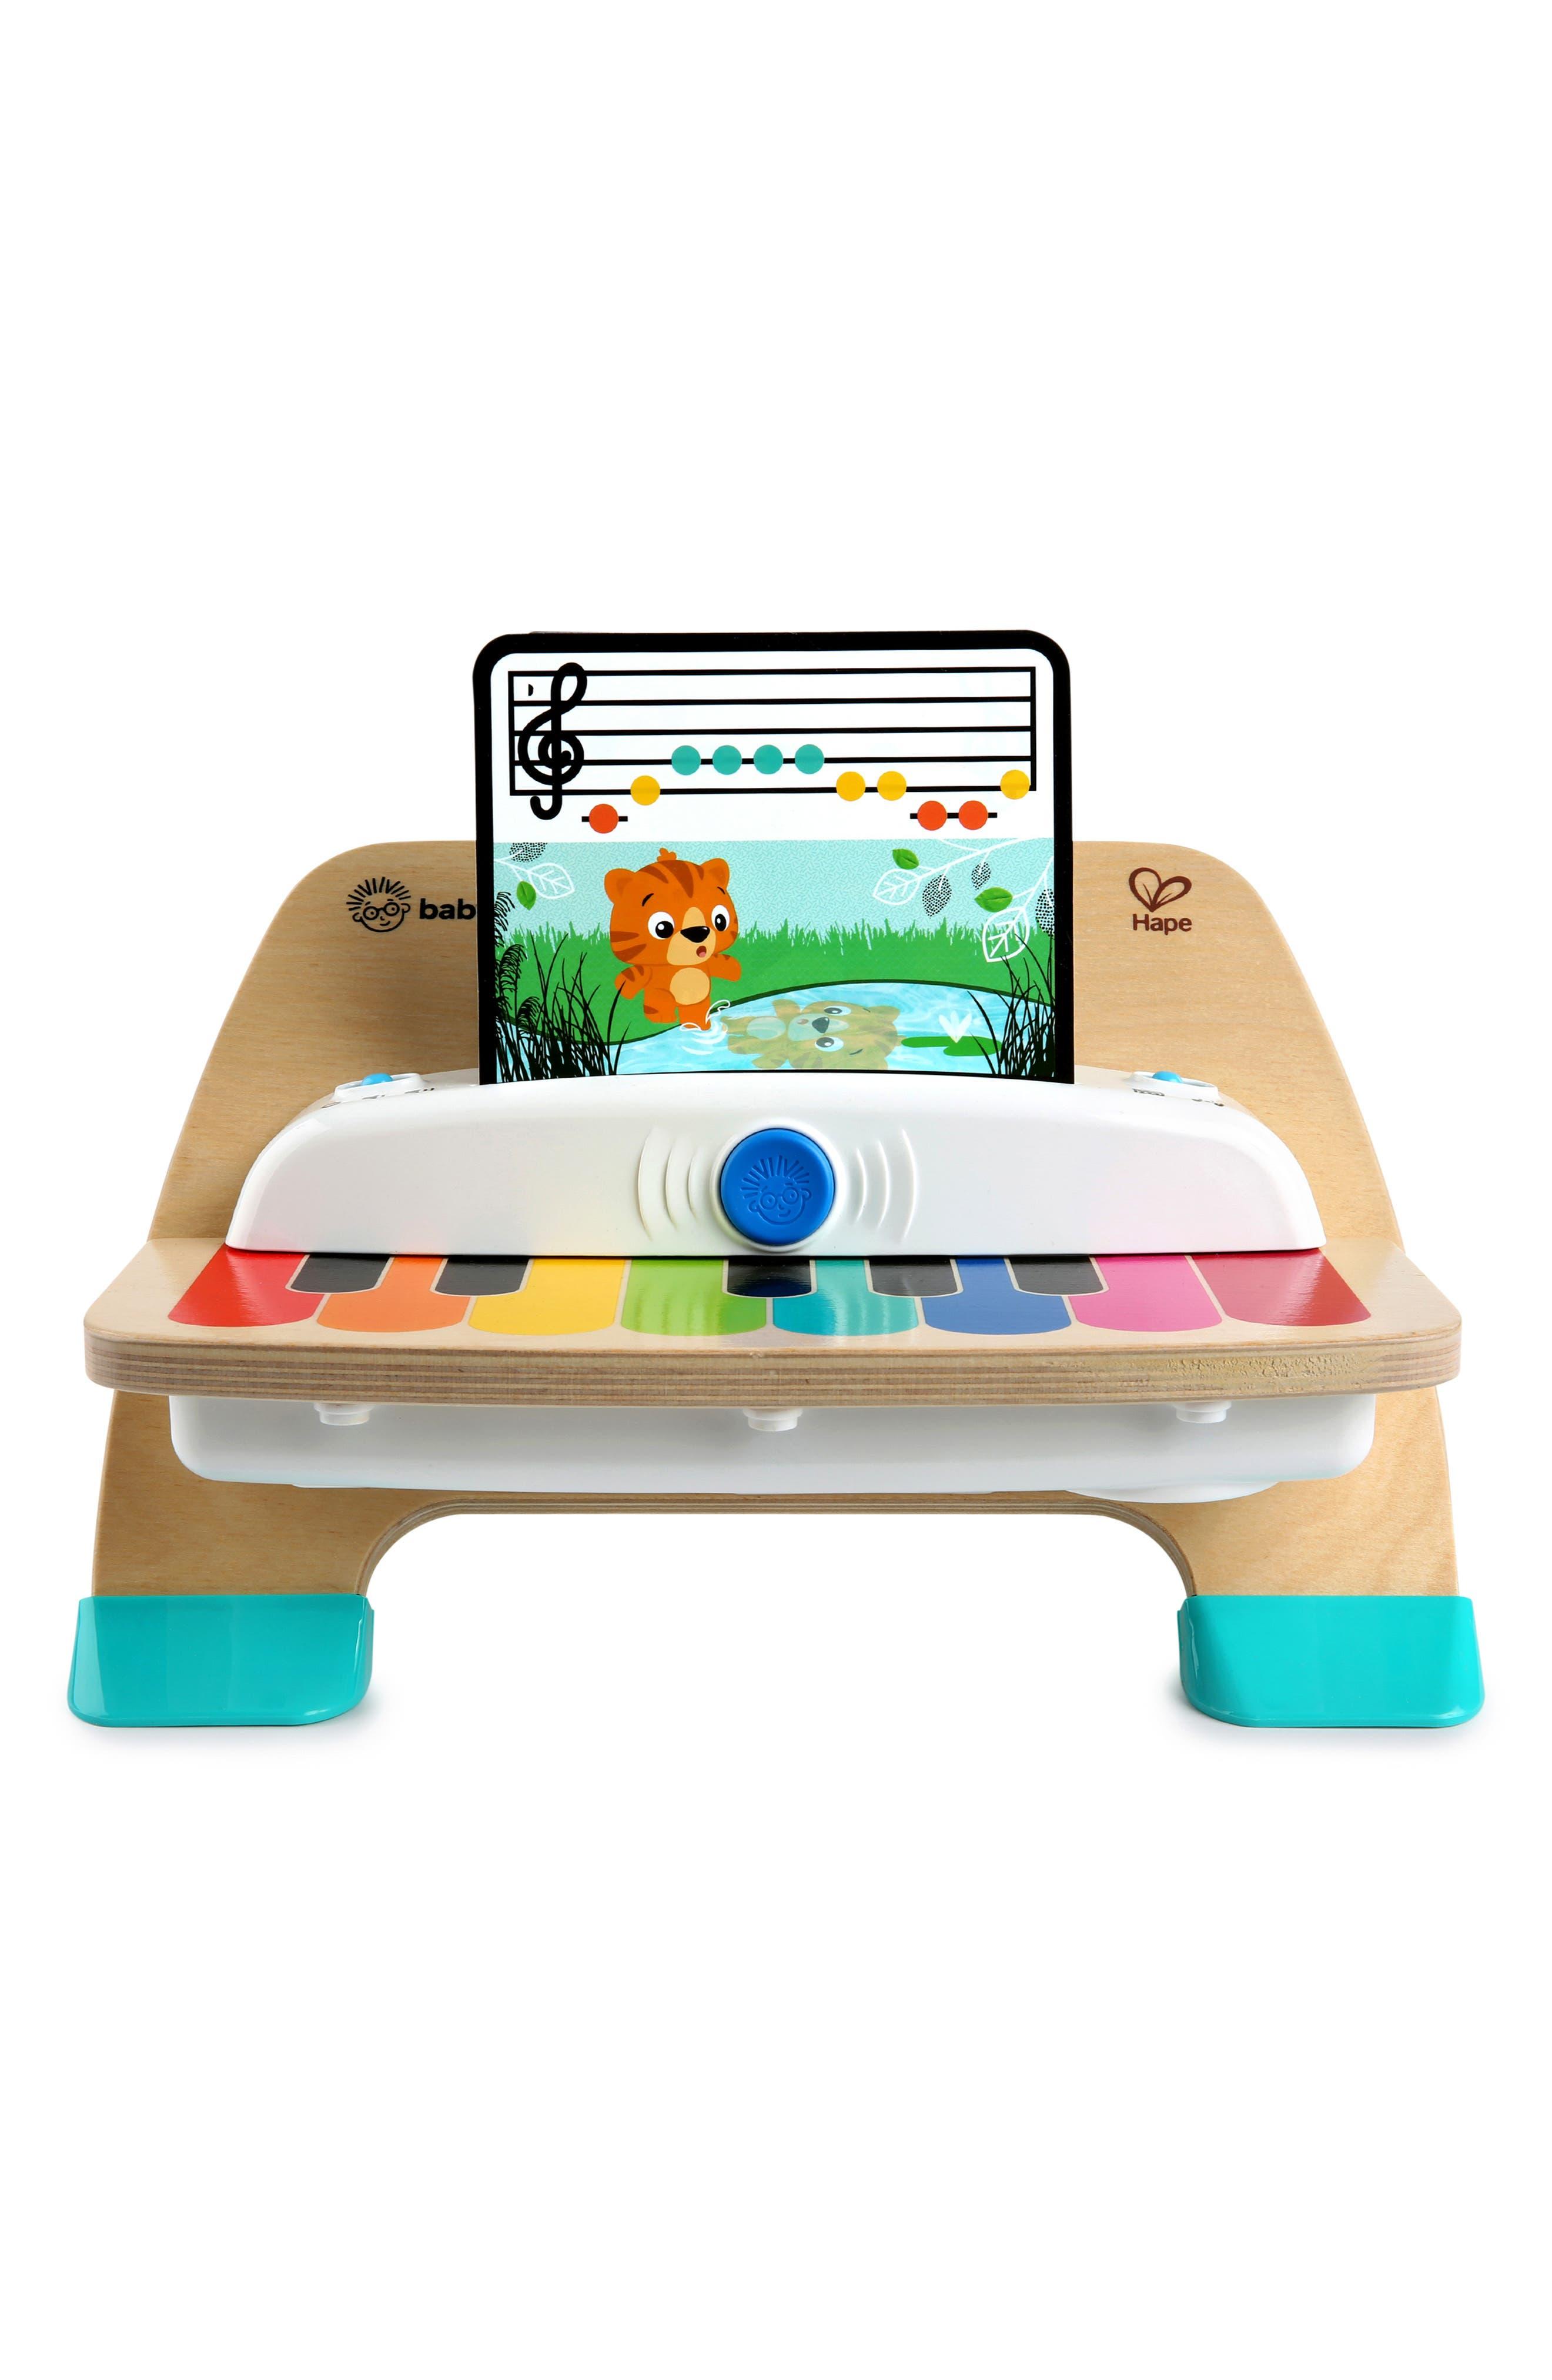 Toddler Baby Einstein Hape Magic Touch Piano(TM) Musical Toy